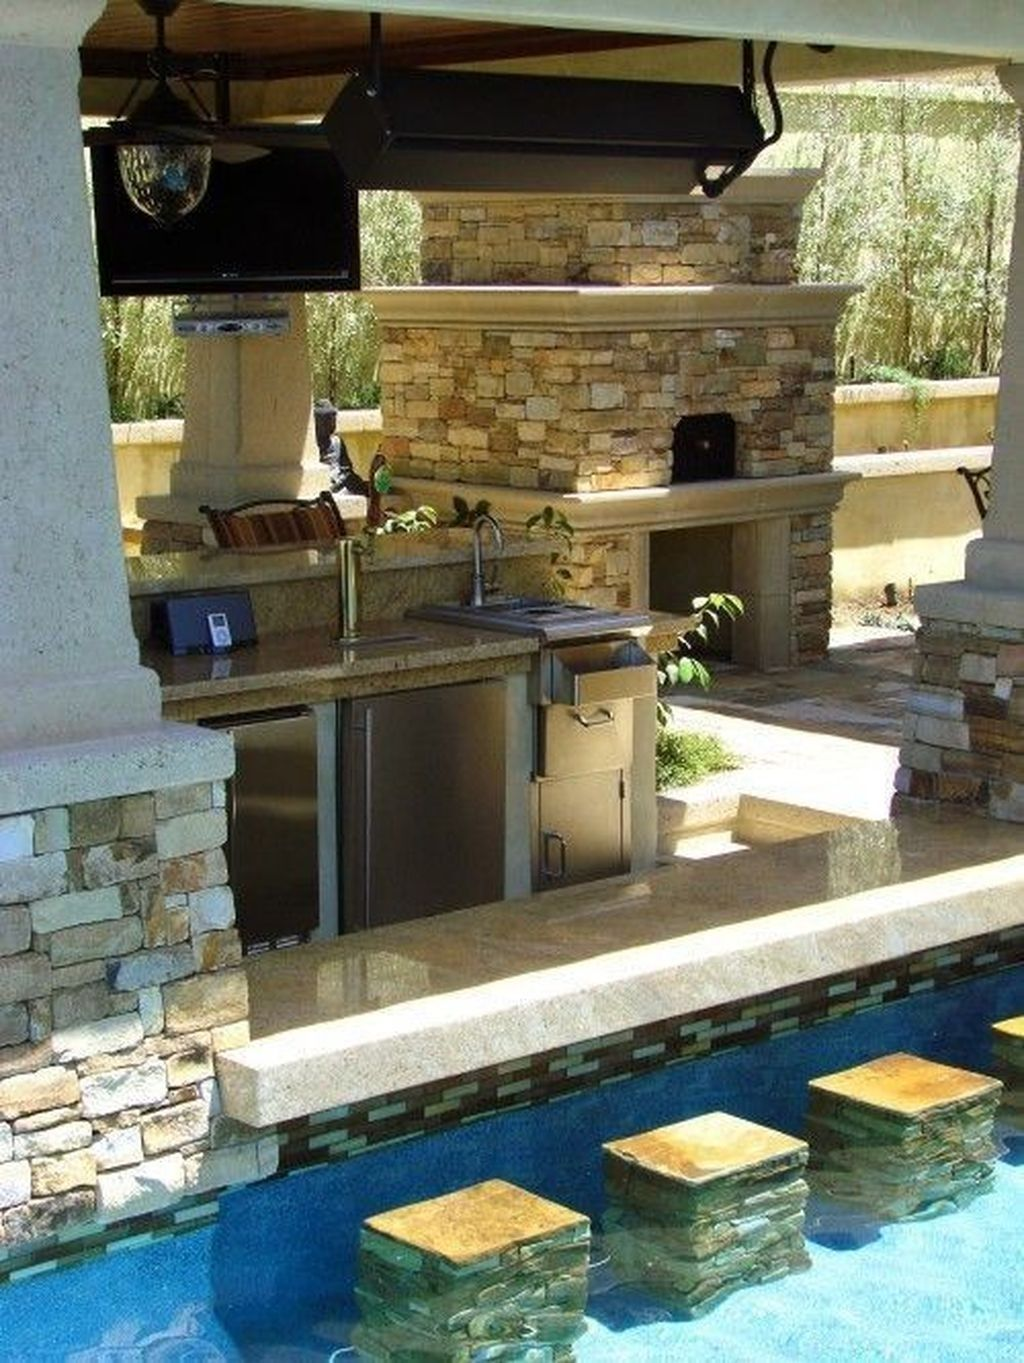 20 Fantastic Mediterranean Swimming Pool Designs Out Of Your Dreams In 2020 Pool Bar Design Outdoor Kitchen Design Dream Backyard Diy backyard swim up bar